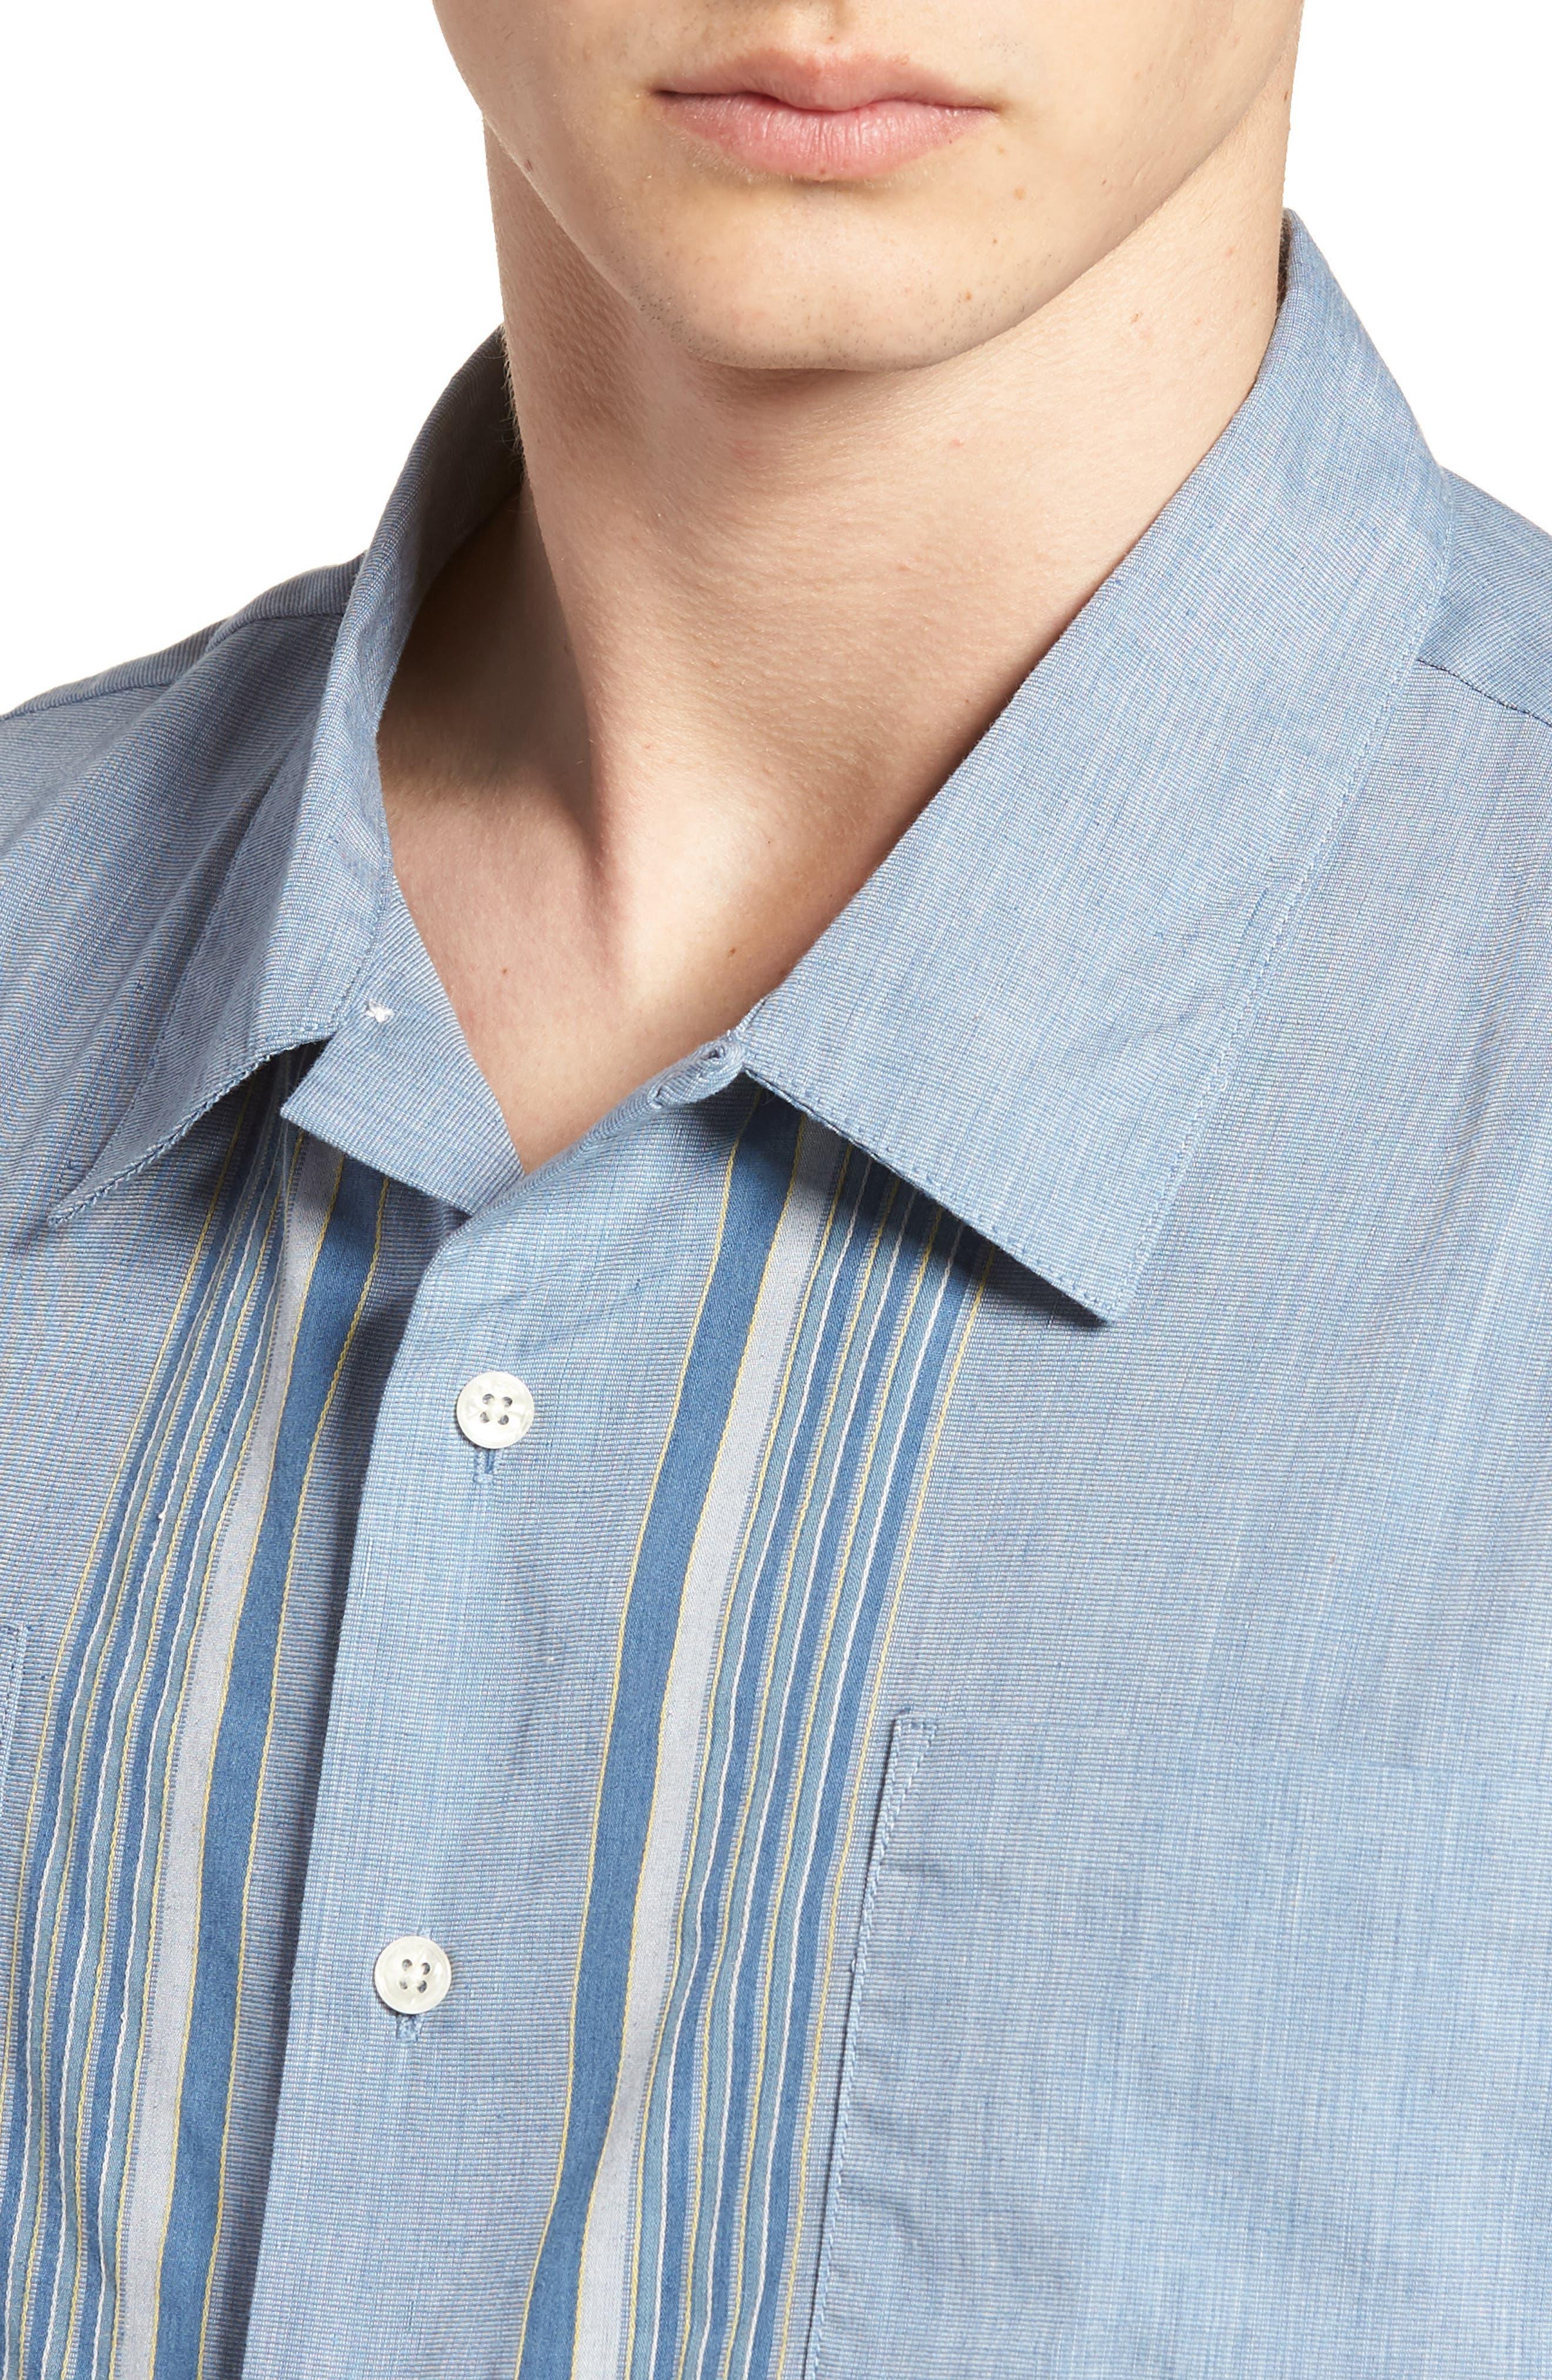 Cruze Woven Shirt,                             Alternate thumbnail 4, color,                             LIGHT BLUE